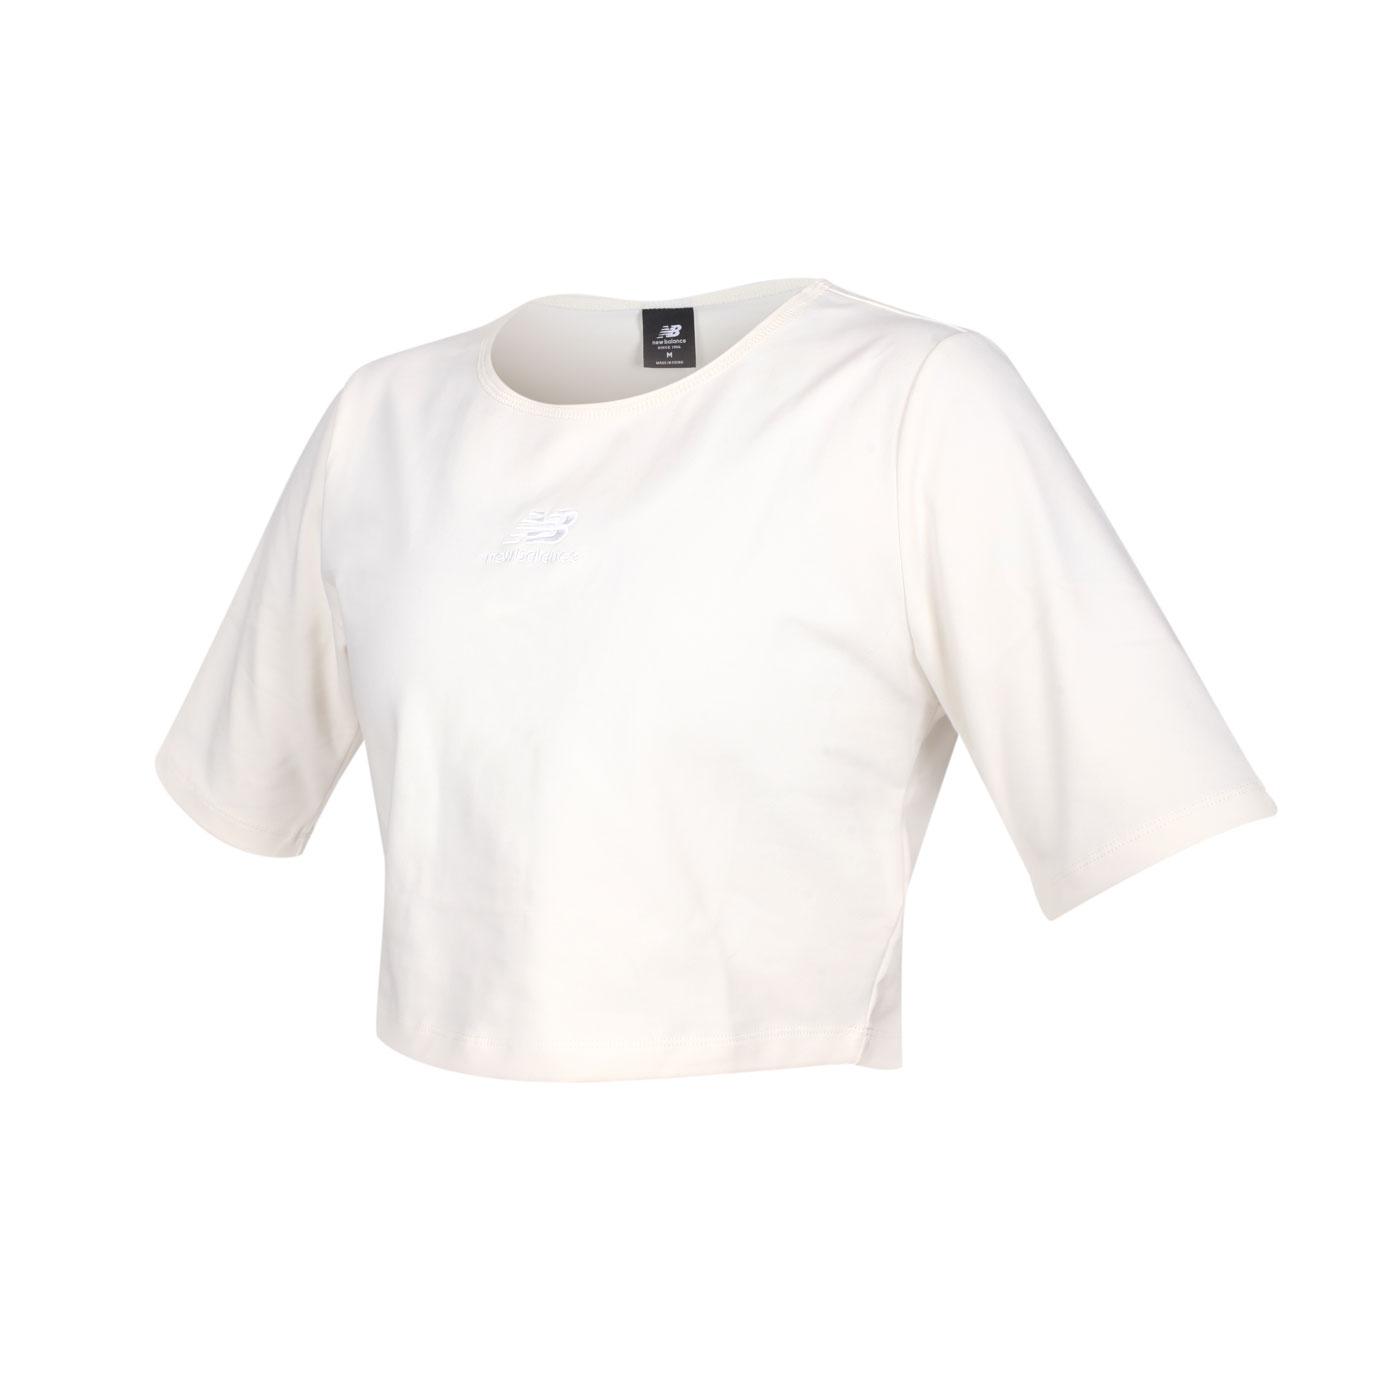 NEW BALANCE 女款短版短袖T恤 WT13555AGA - 米白